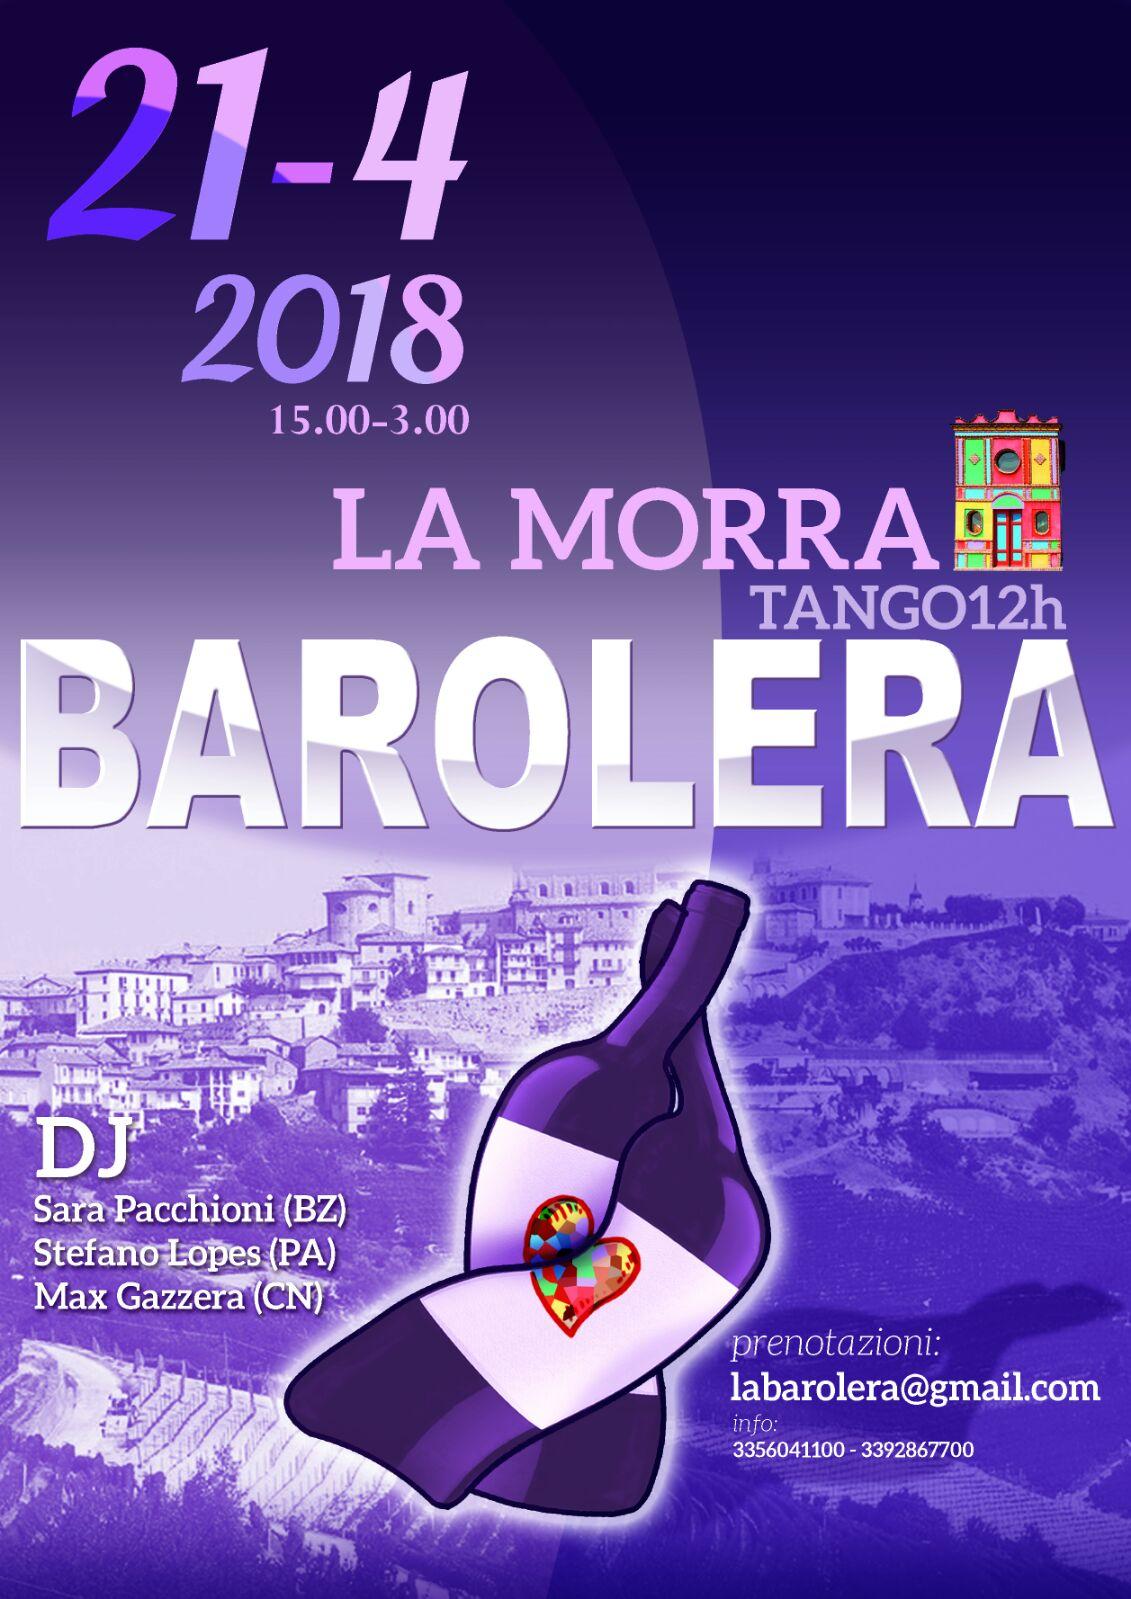 barolera_defin